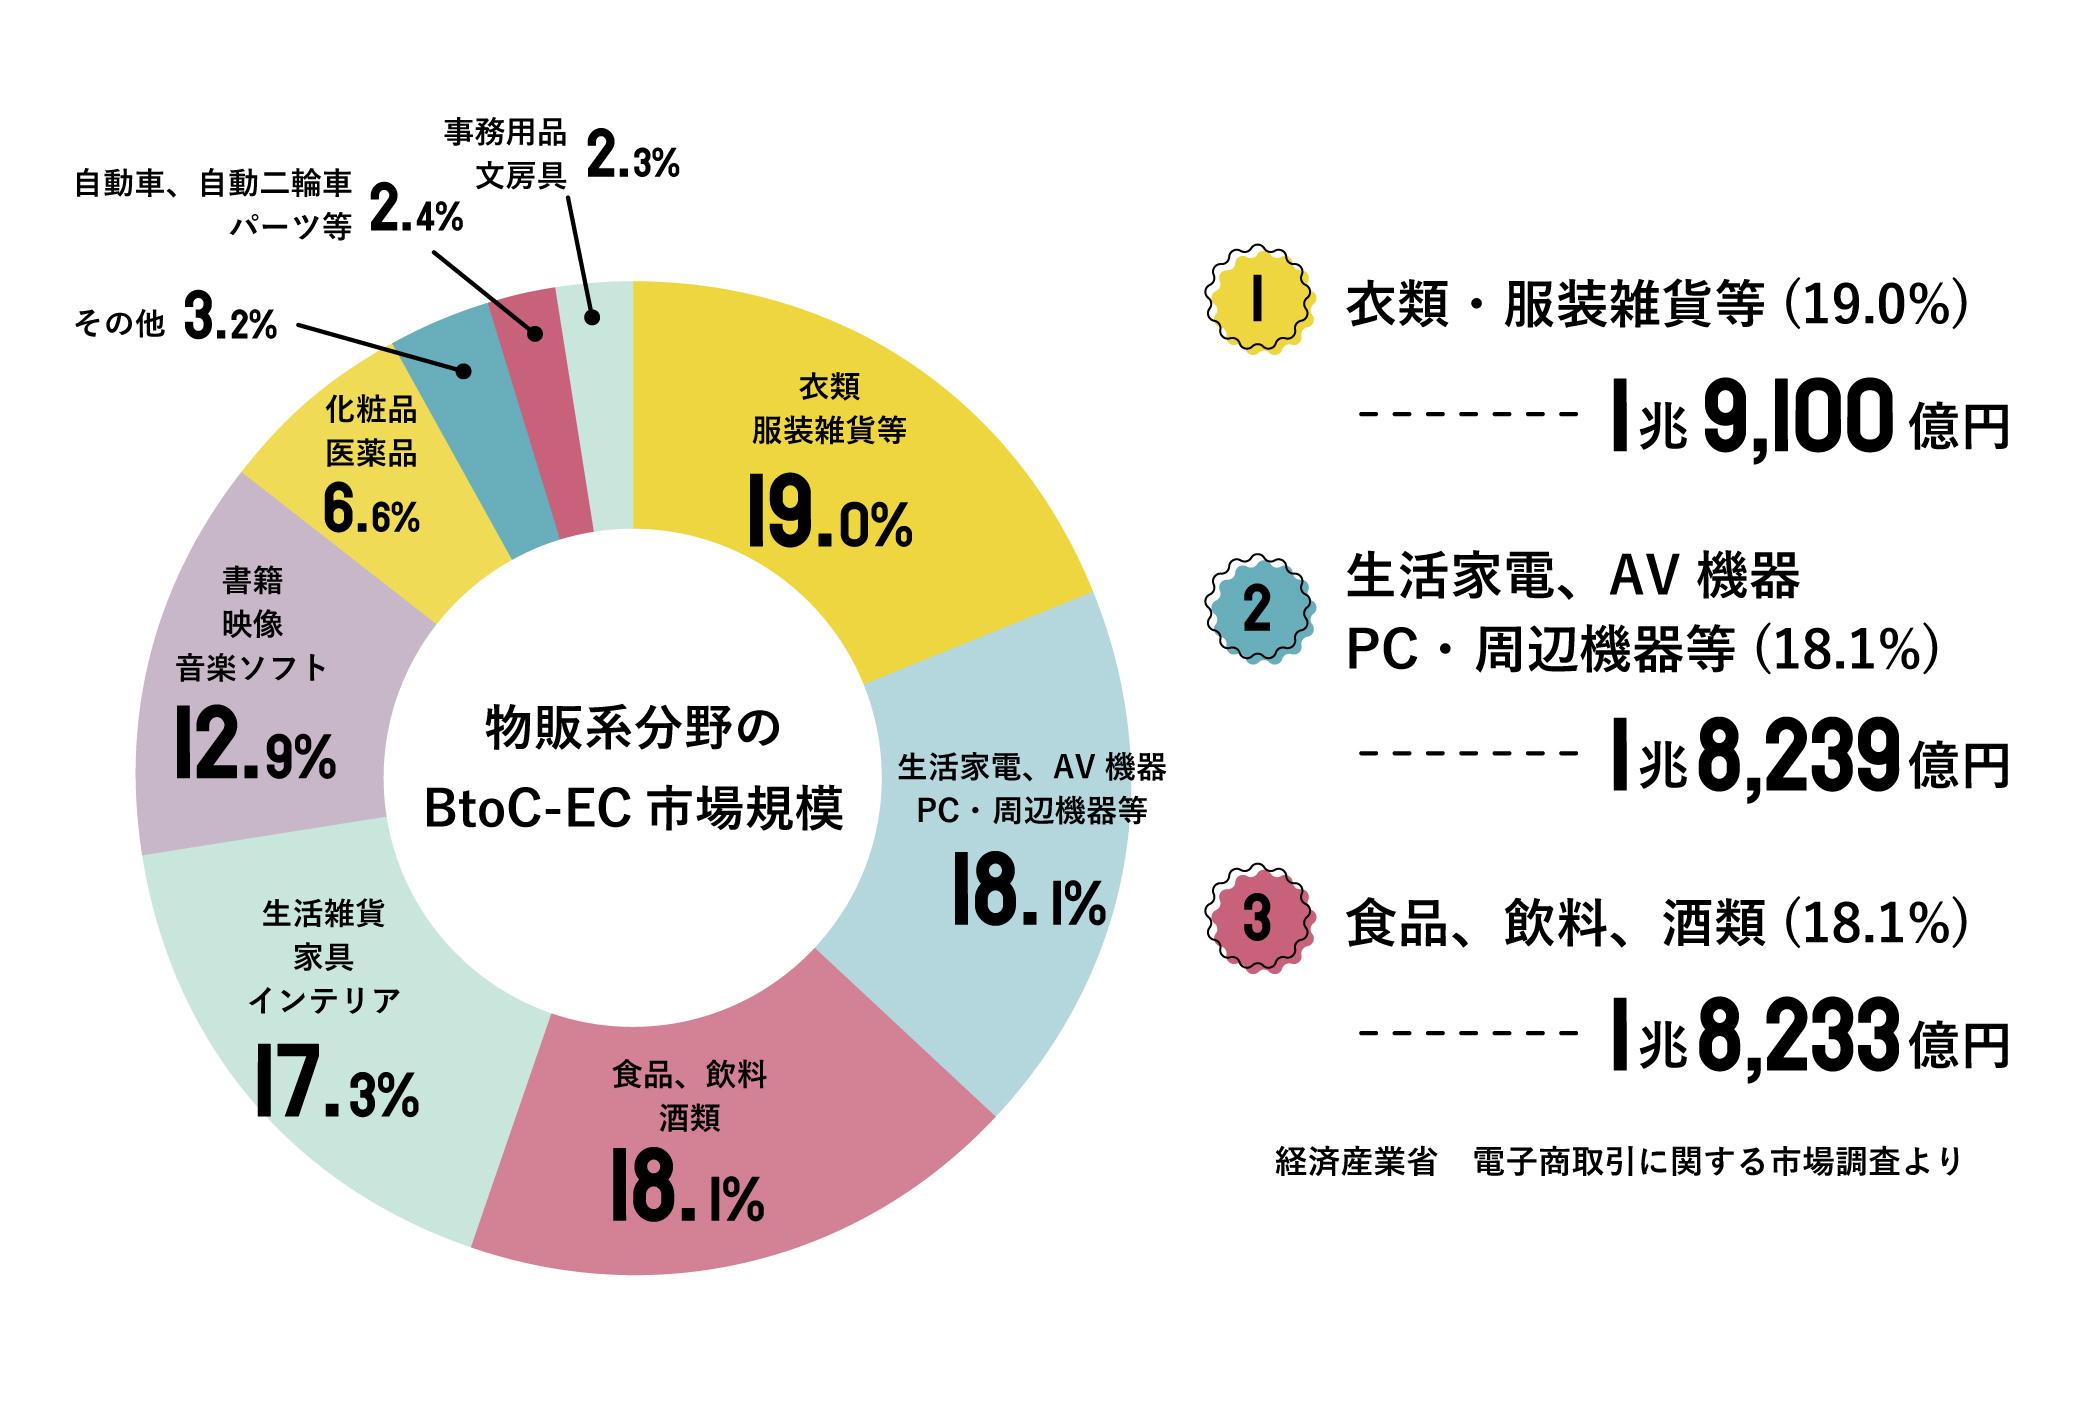 物販系分野のBtoC-EC市場規模